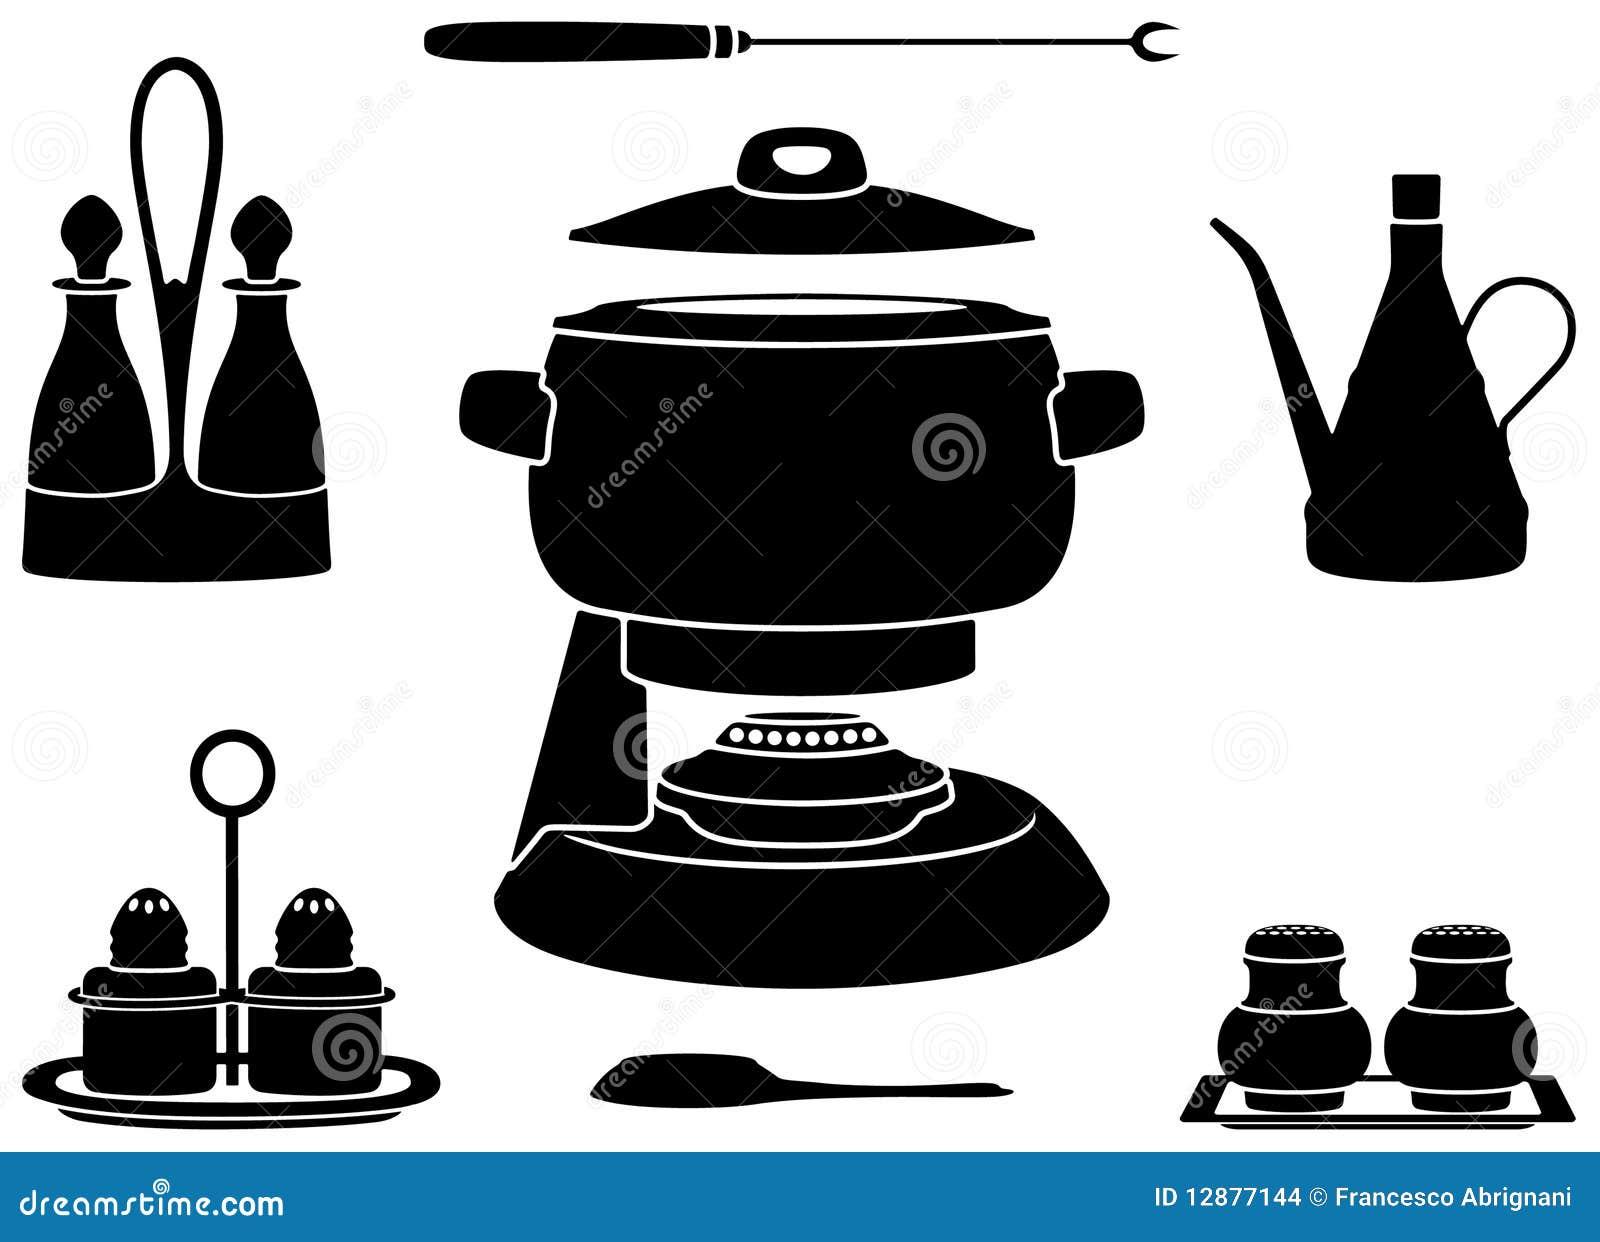 Fondue Cartoons Illustrations Amp Vector Stock Images 498